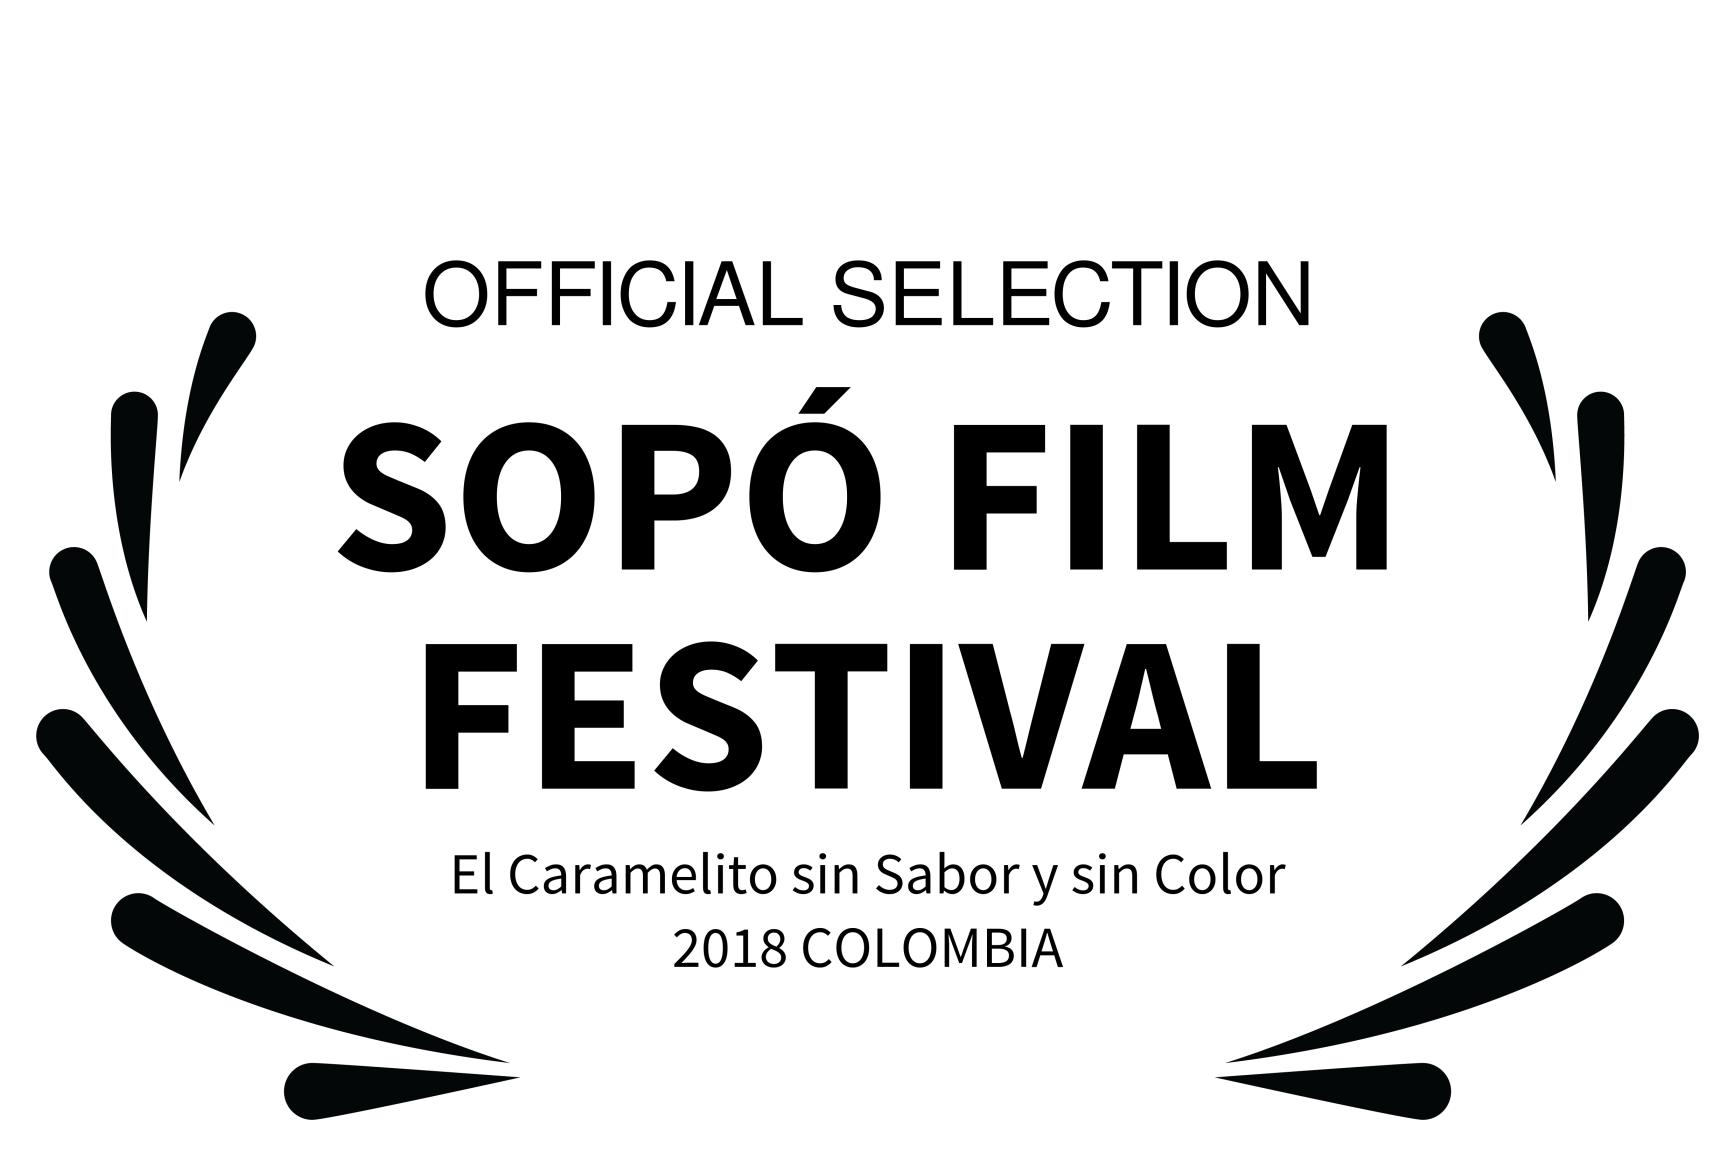 OFFICIAL SELECTION - SOP FILM FESTIVAL -